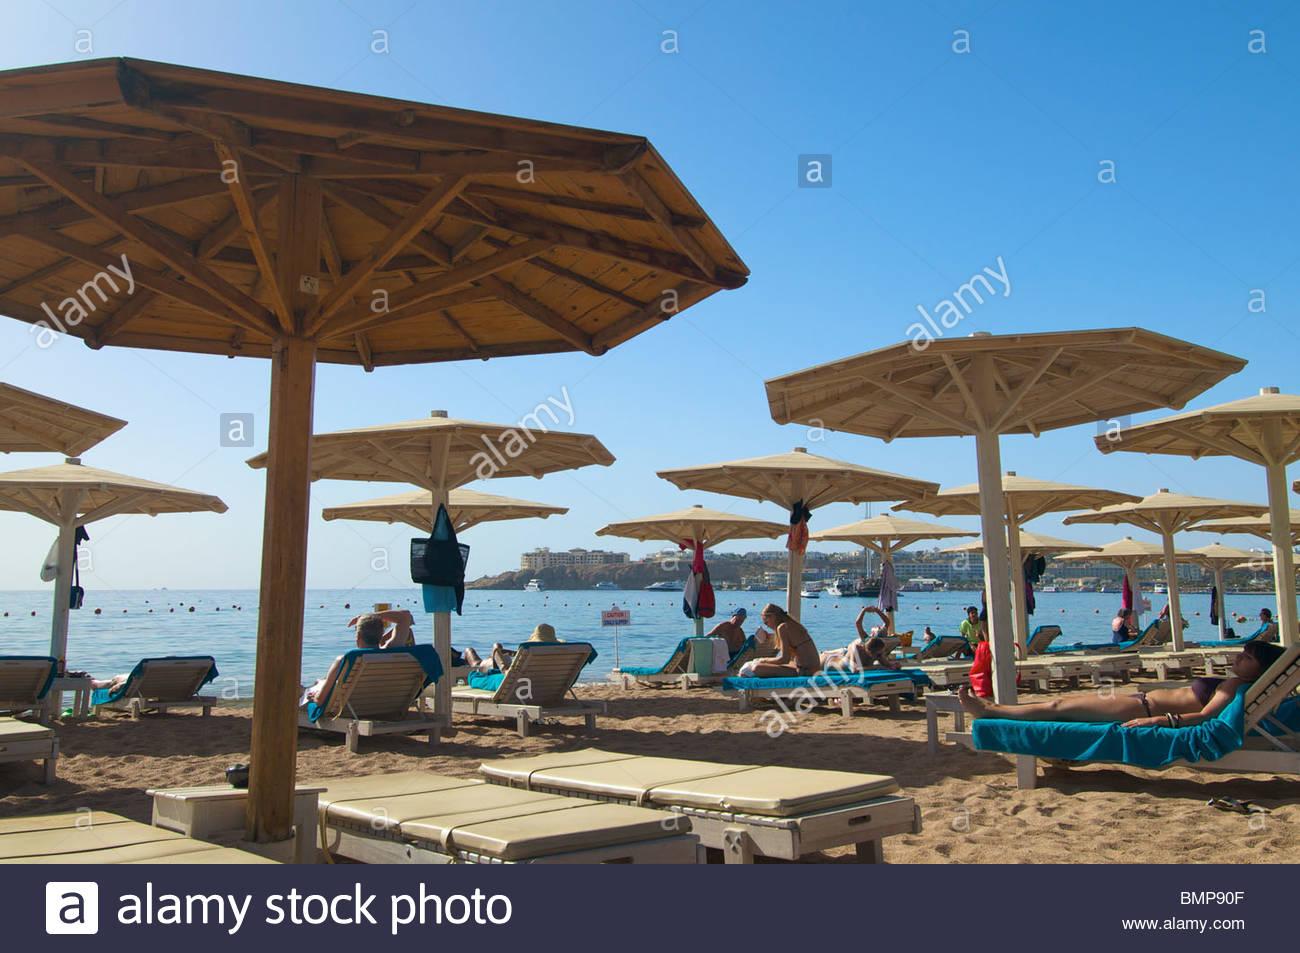 Novotel Naama Bay Palm Hotel Naama Bay Sharm el Sheikh Egypt - Stock Image